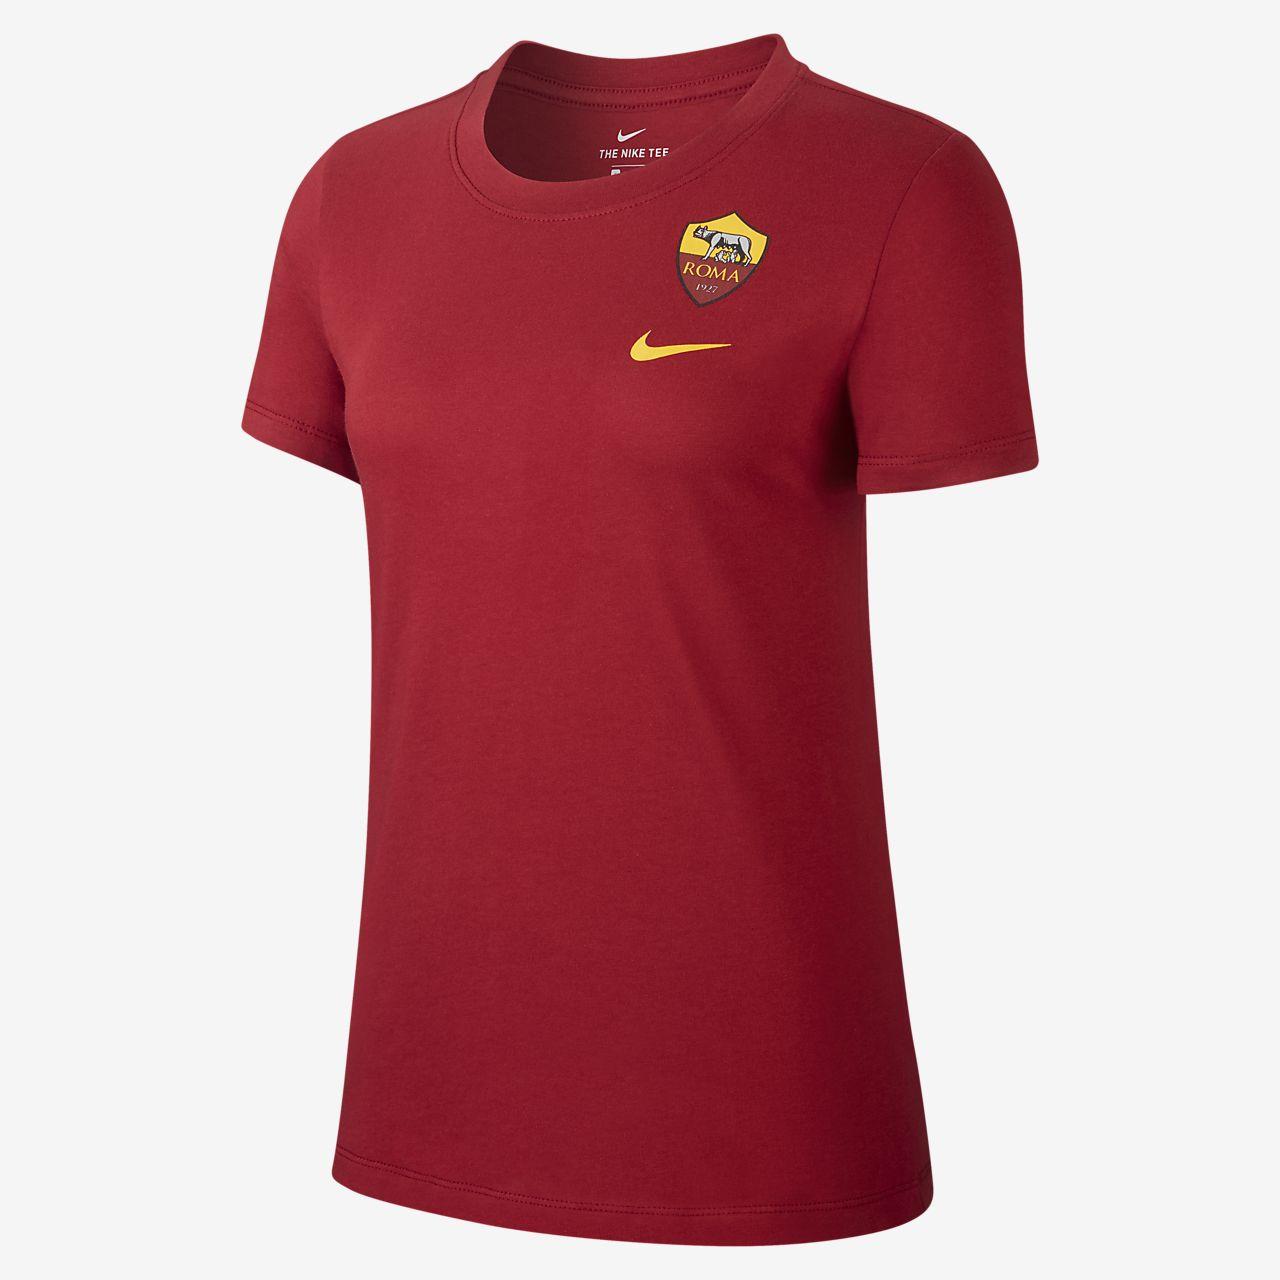 e3507f6be7 A.S. Roma női póló. Nike.com HU